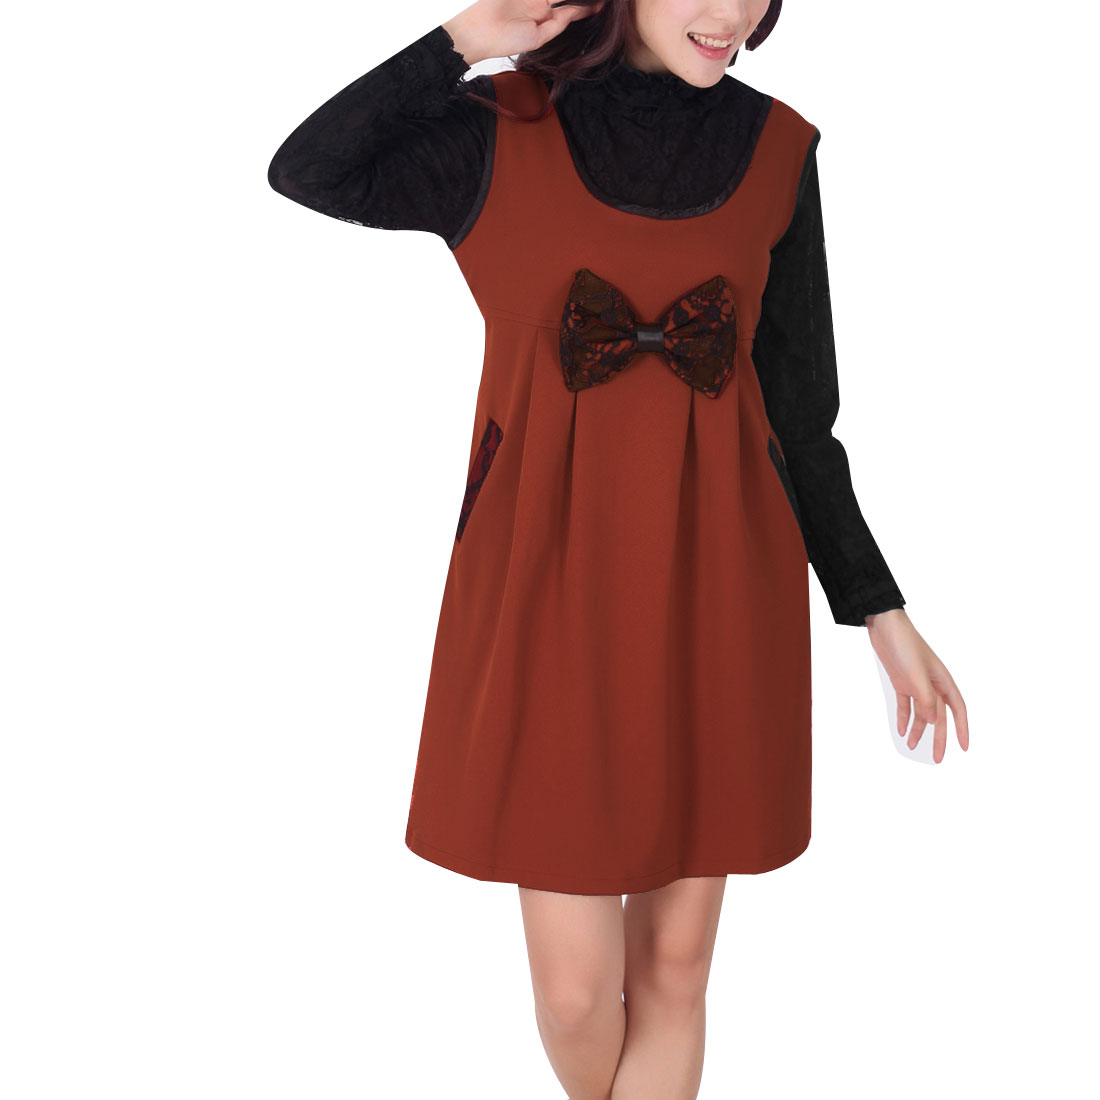 Maternity Dark Orange Scoop Neck Sleeveless Bowknot Decor Slant Pockets Tunic Shirt L